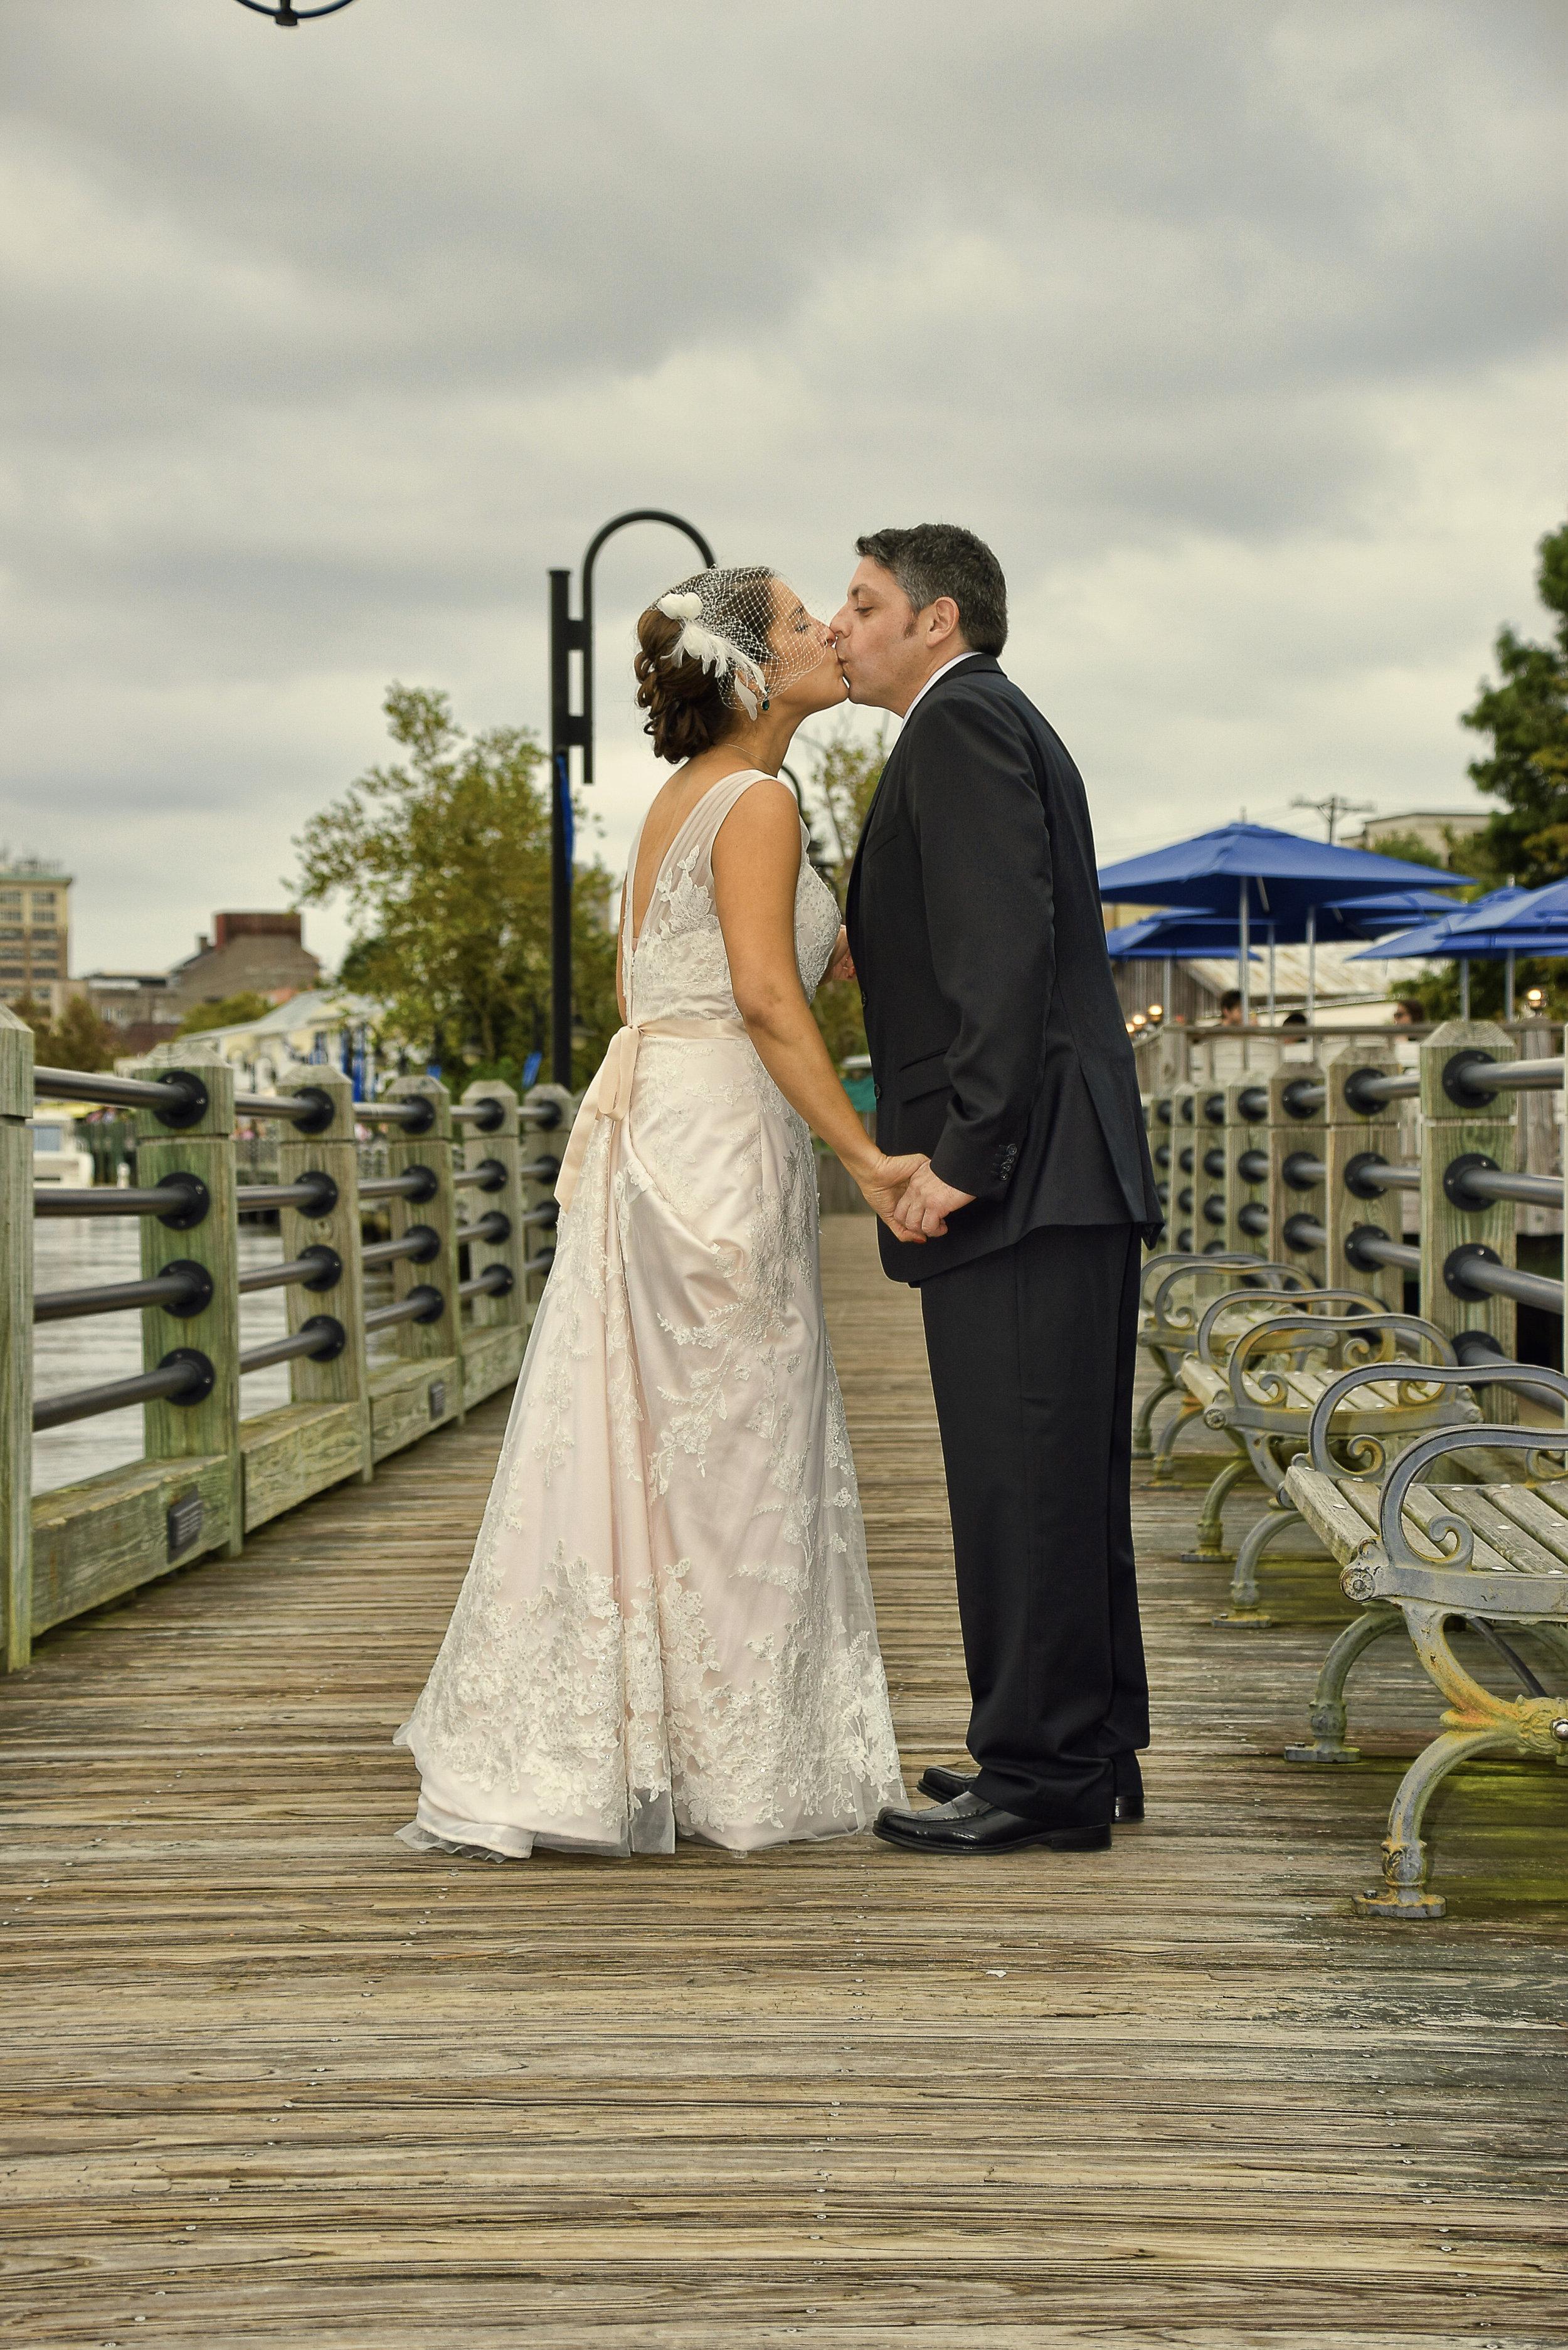 Riverwalk kiss.